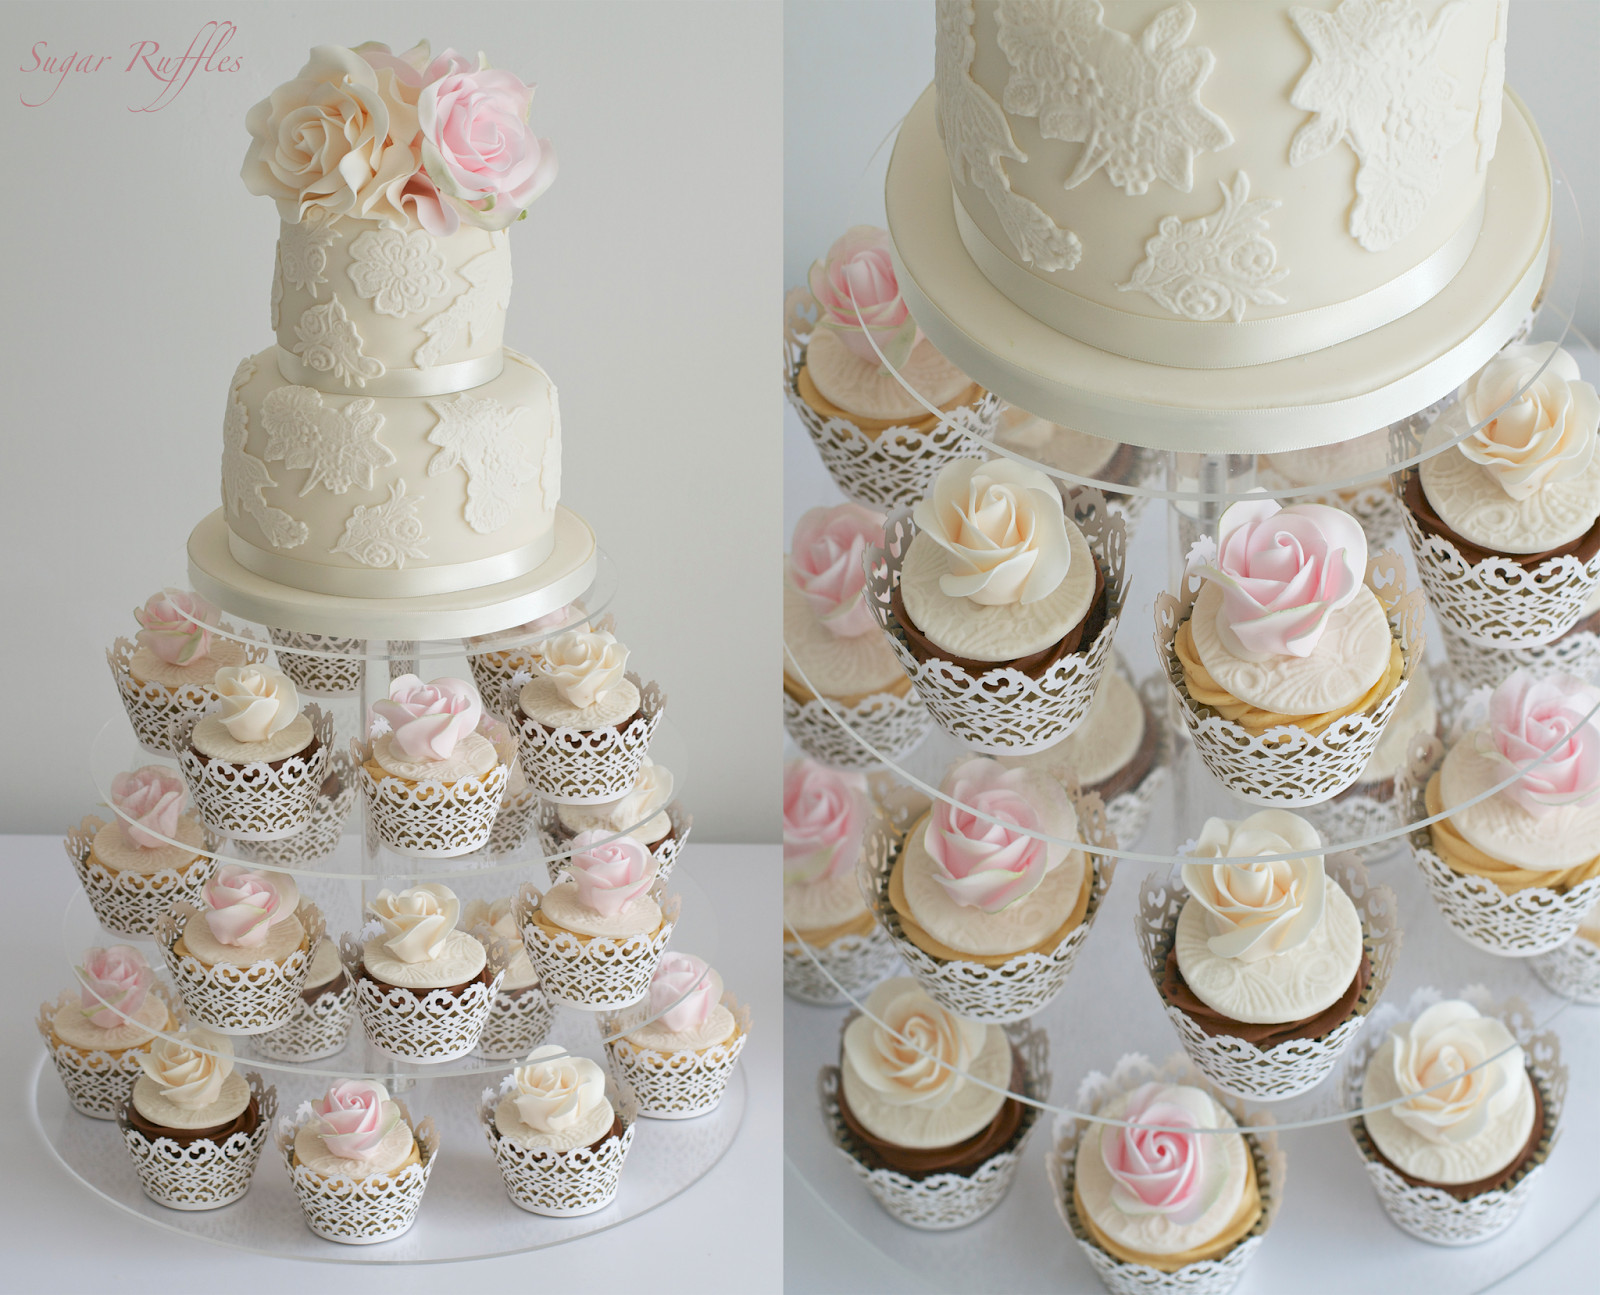 Wedding Cupcake Cakes  Sugar Ruffles Elegant Wedding Cakes Barrow in Furness